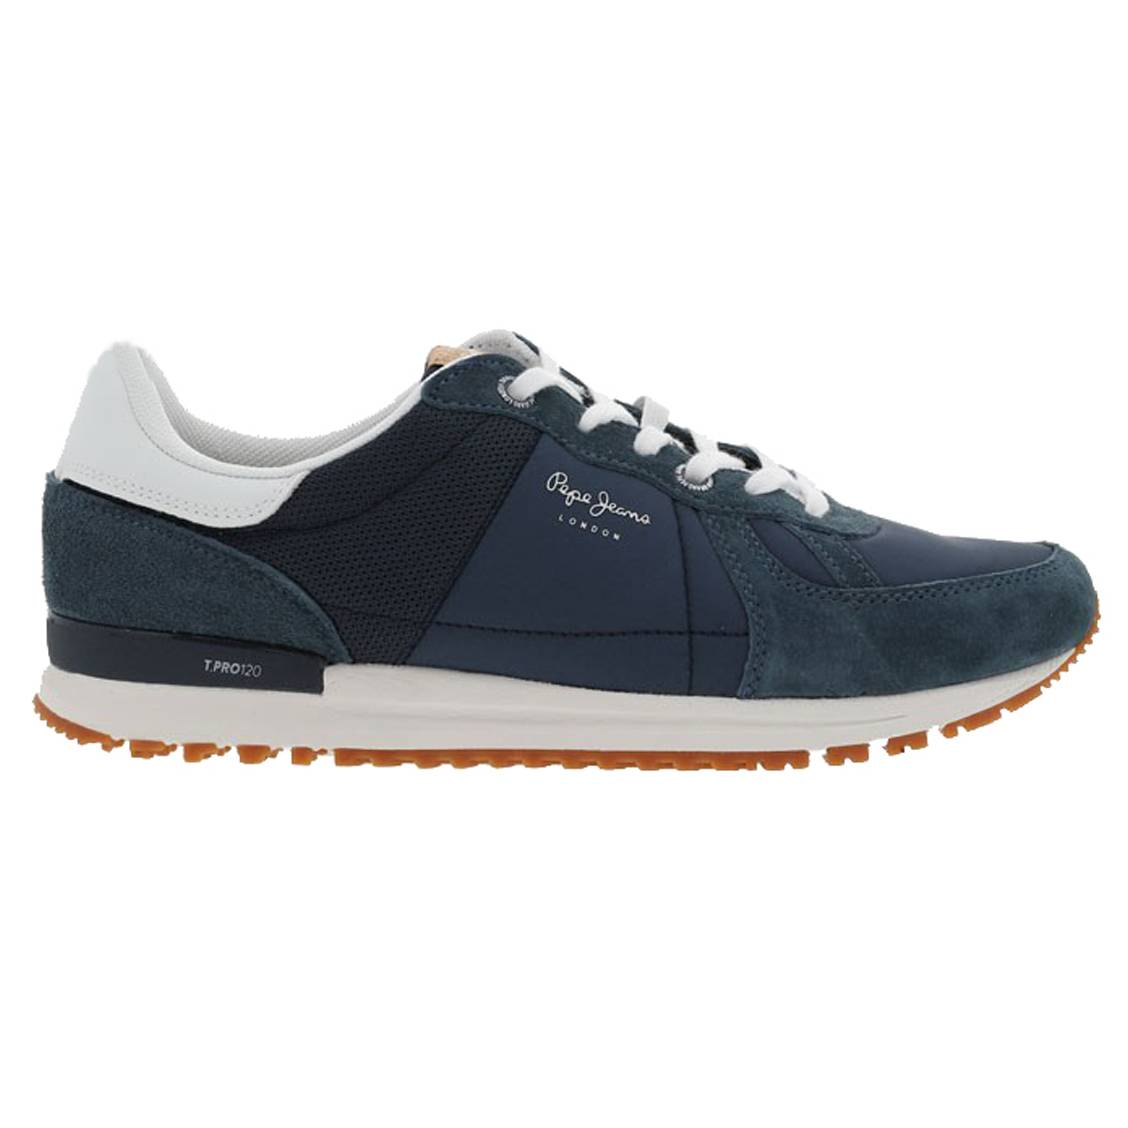 Baskets pepe jeans tinker en cuir et mesh bleu marine et blancs